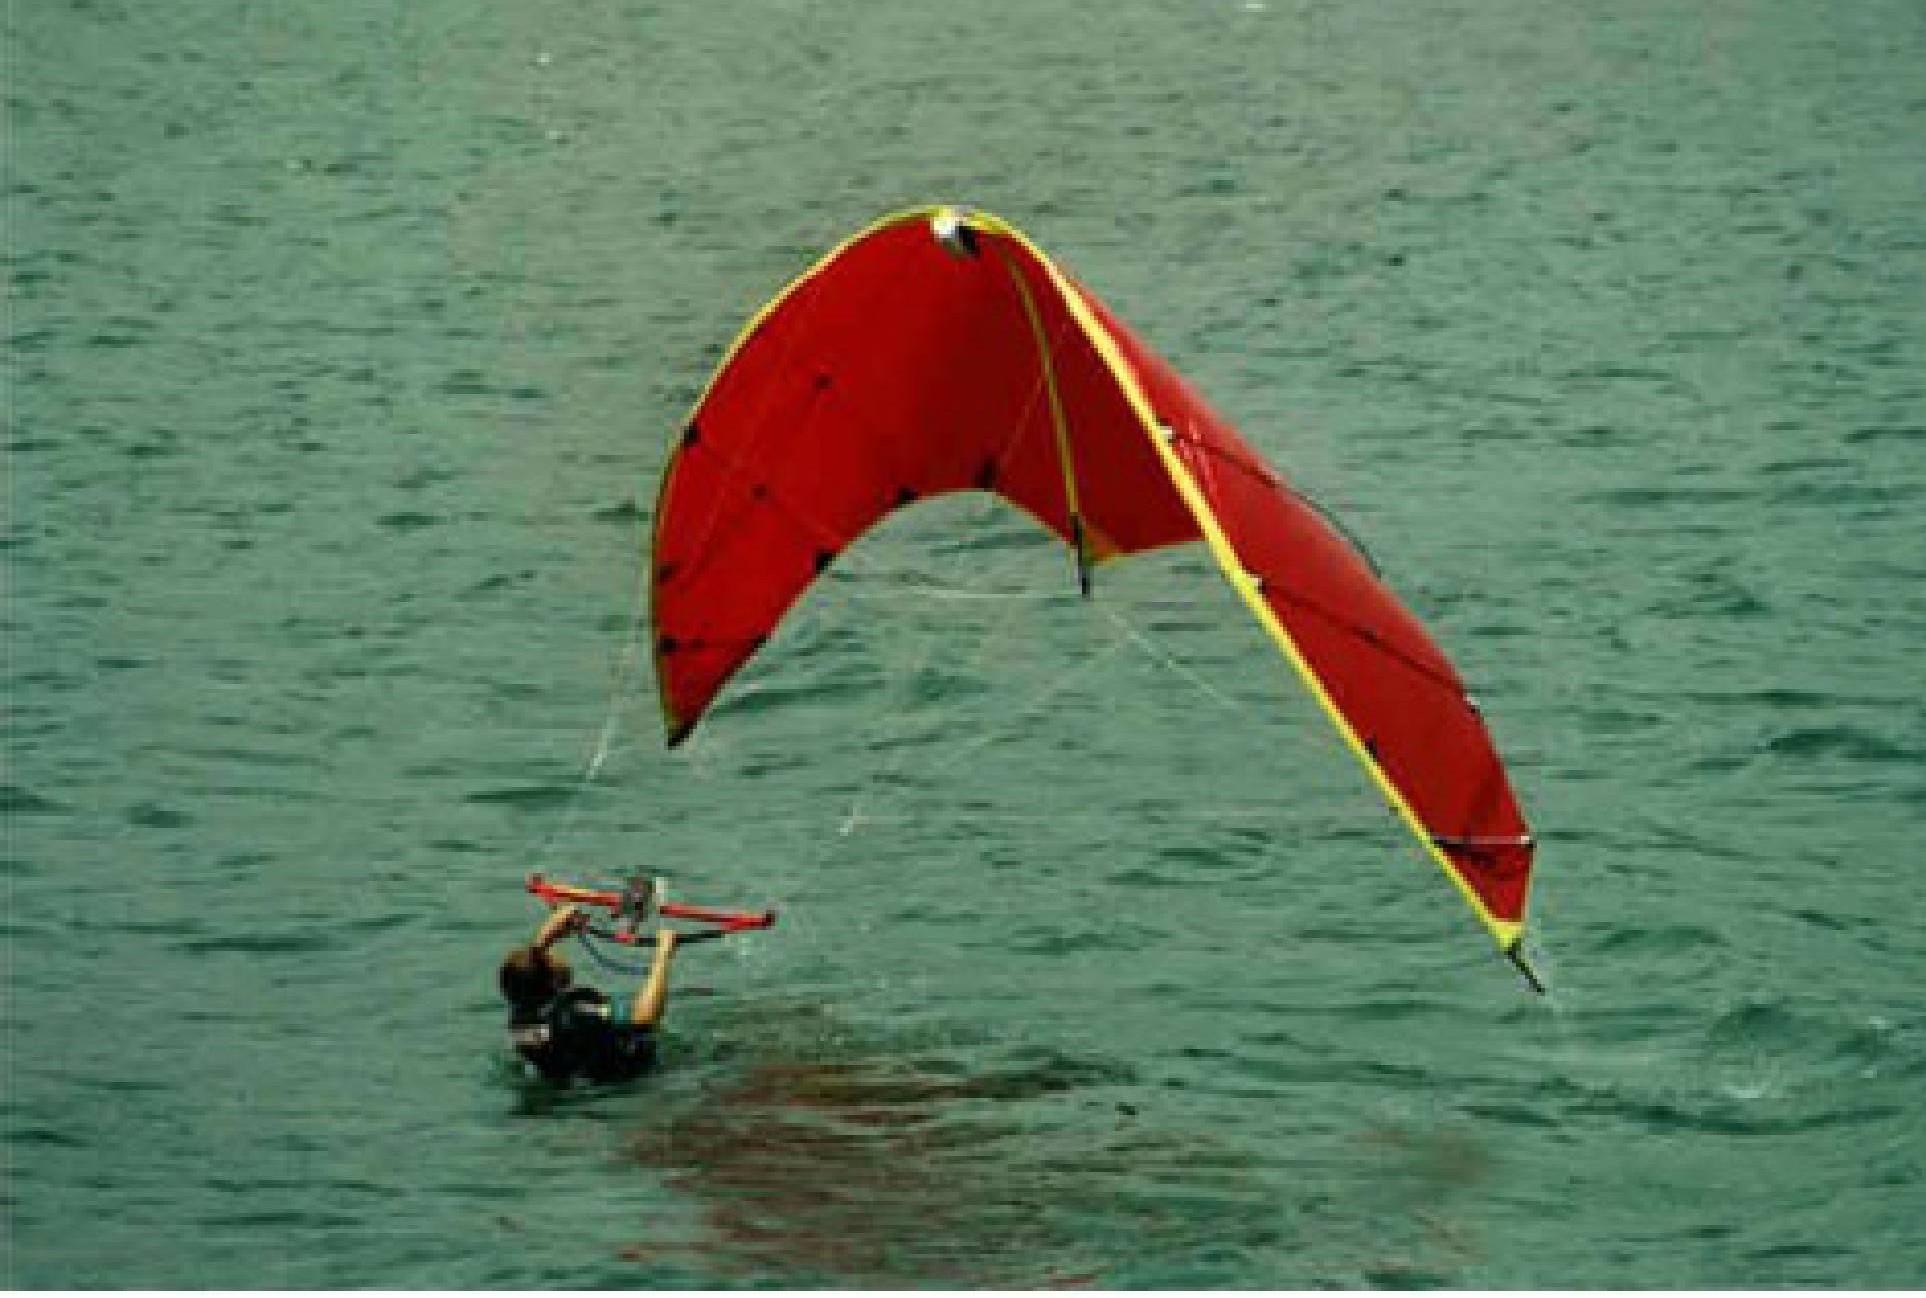 кайтсерфинг, спорт, кейт, ветер, волна